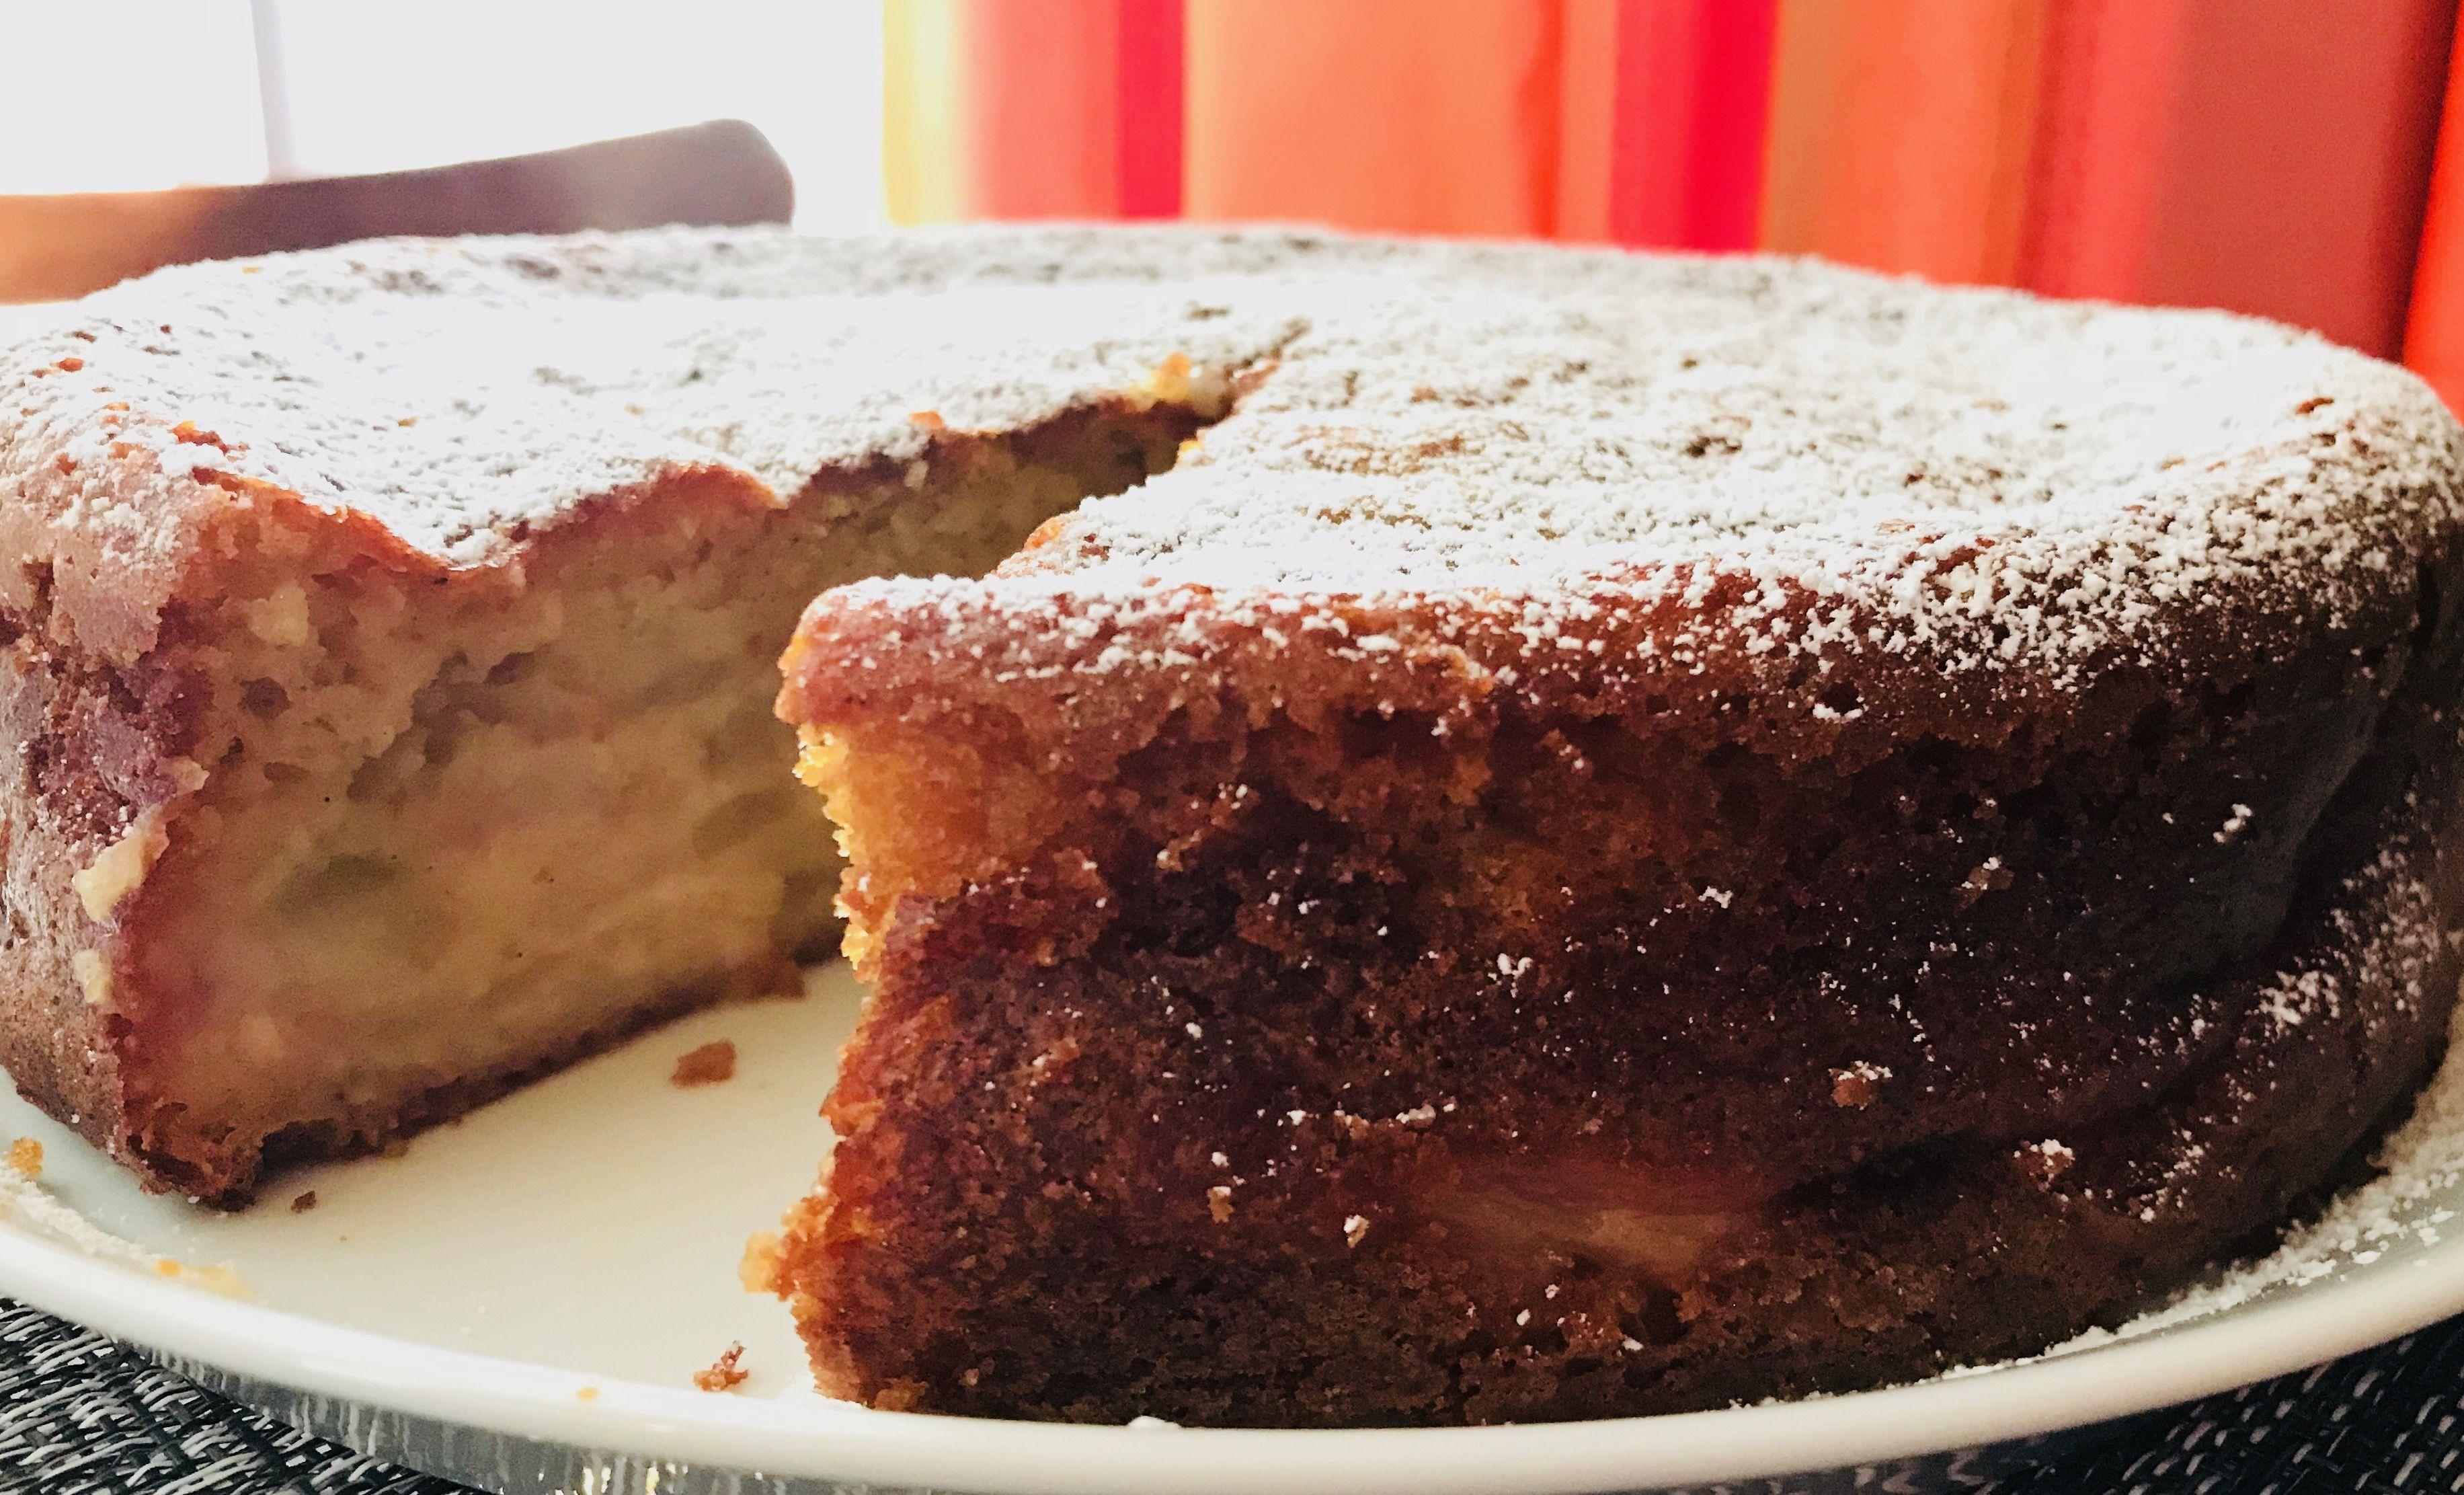 Cardamom cake | Recipe | Cardamom cake, Desserts, Cake recipes